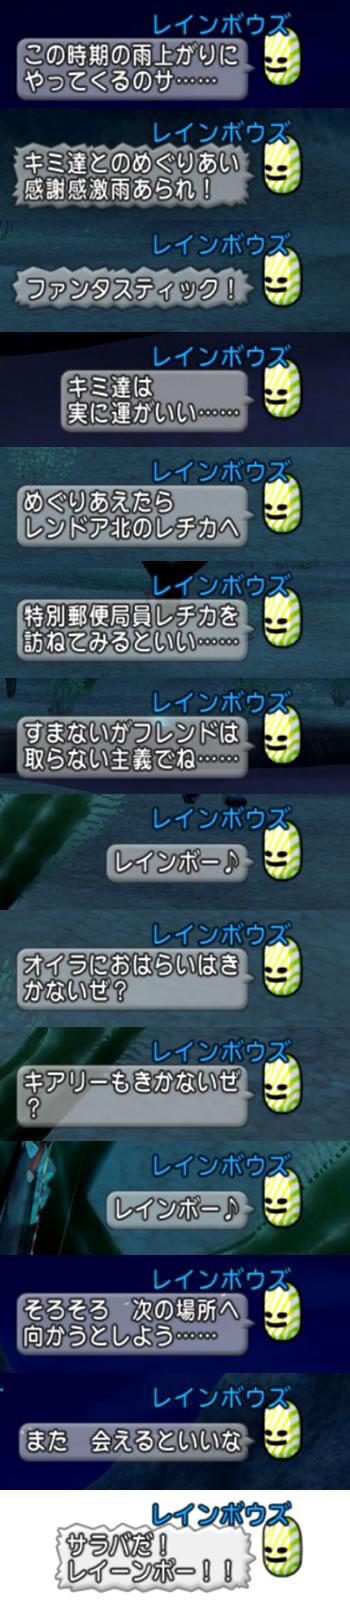 2016_7_10_2